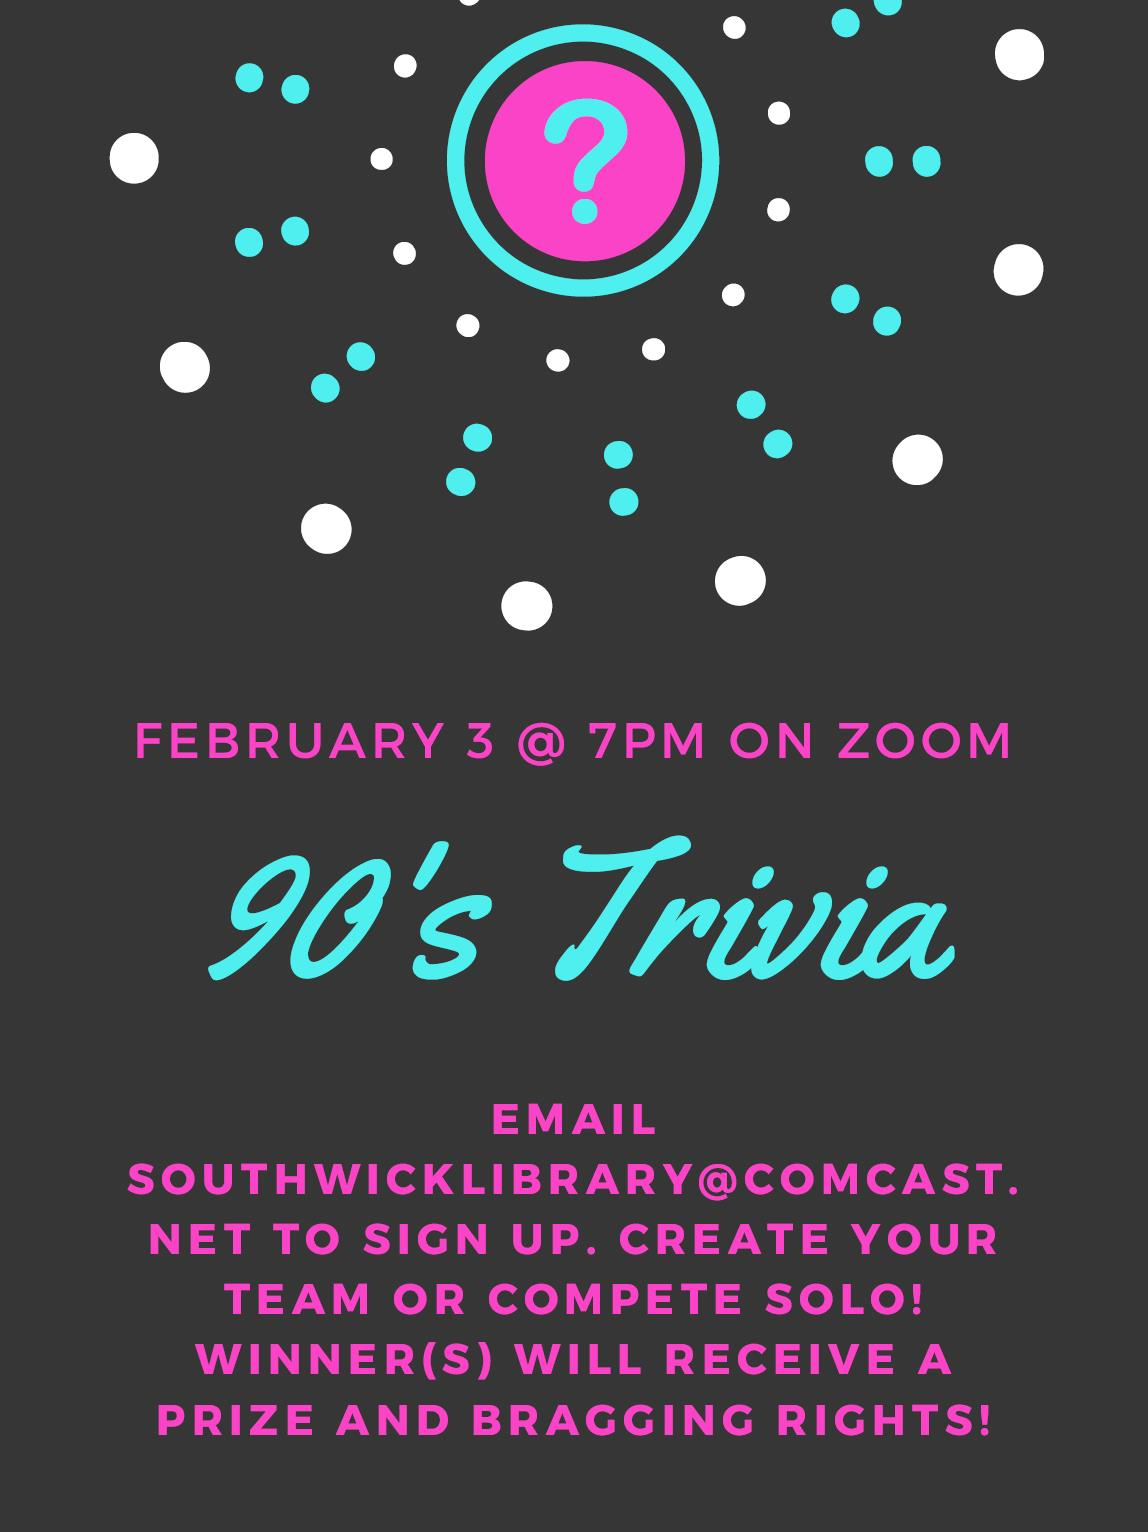 Southwick Public Library presents 90's Trivia Event